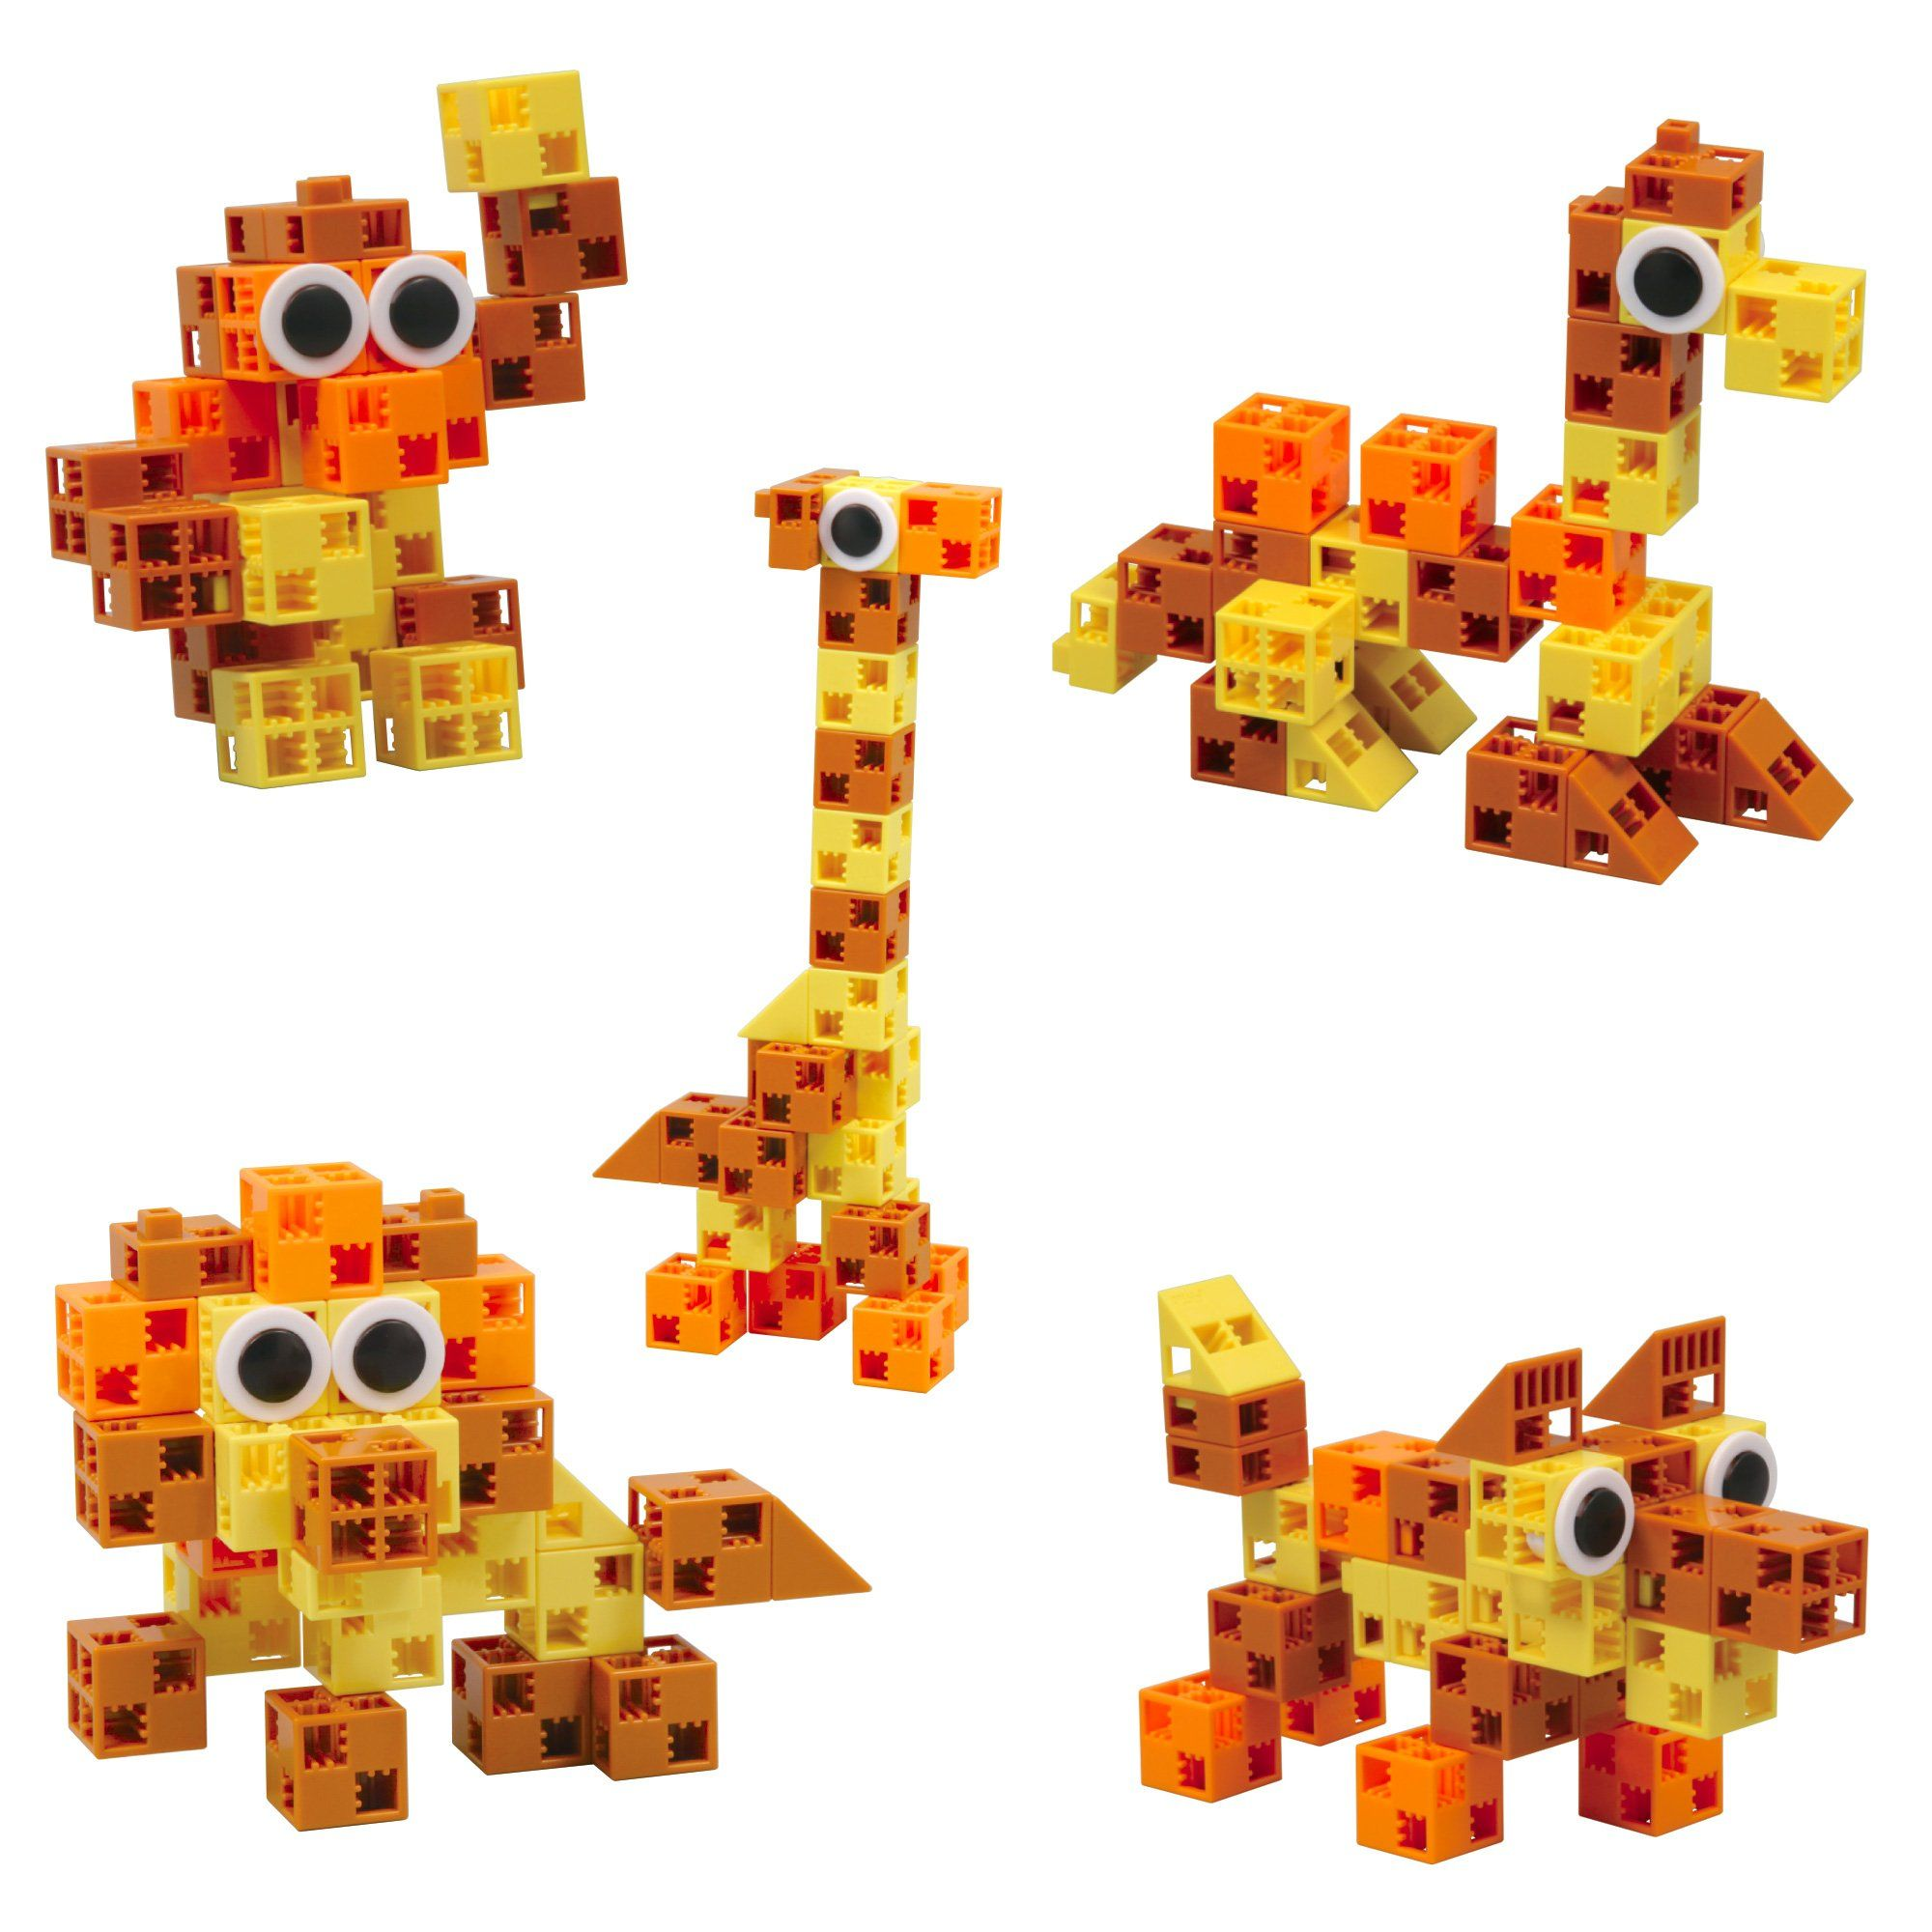 A Brick Toys Animal Kingdom 30pc Building Block Set Best